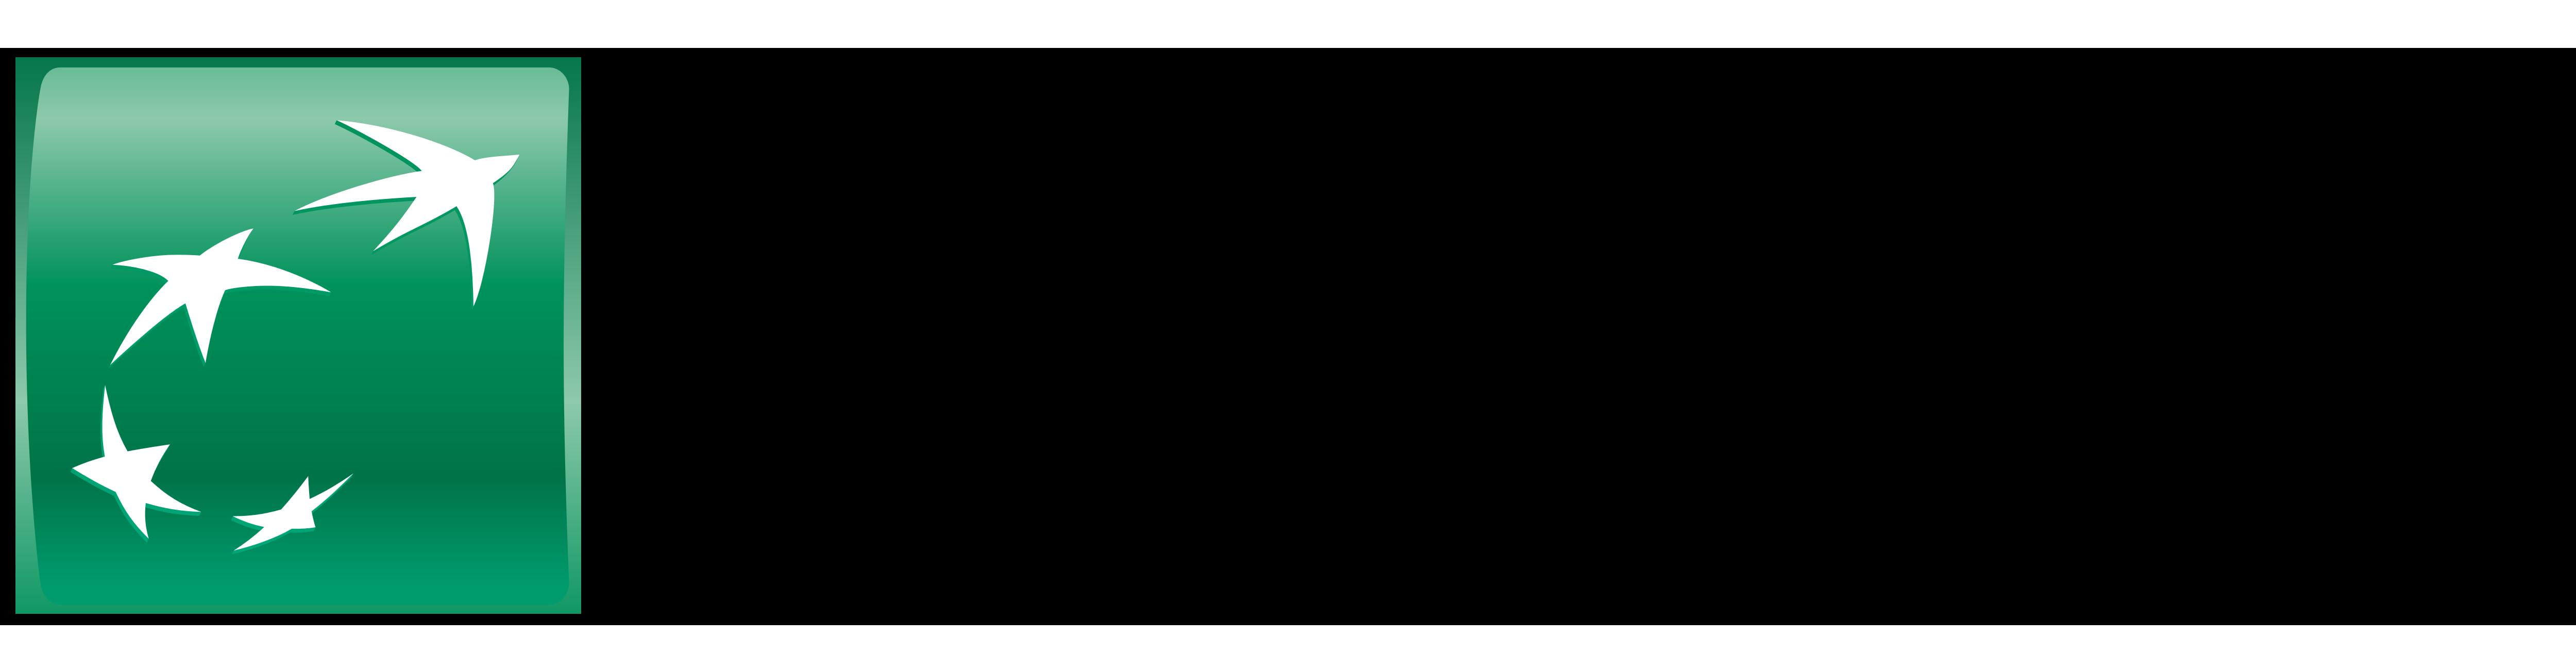 BNP Paribas – Logos Download